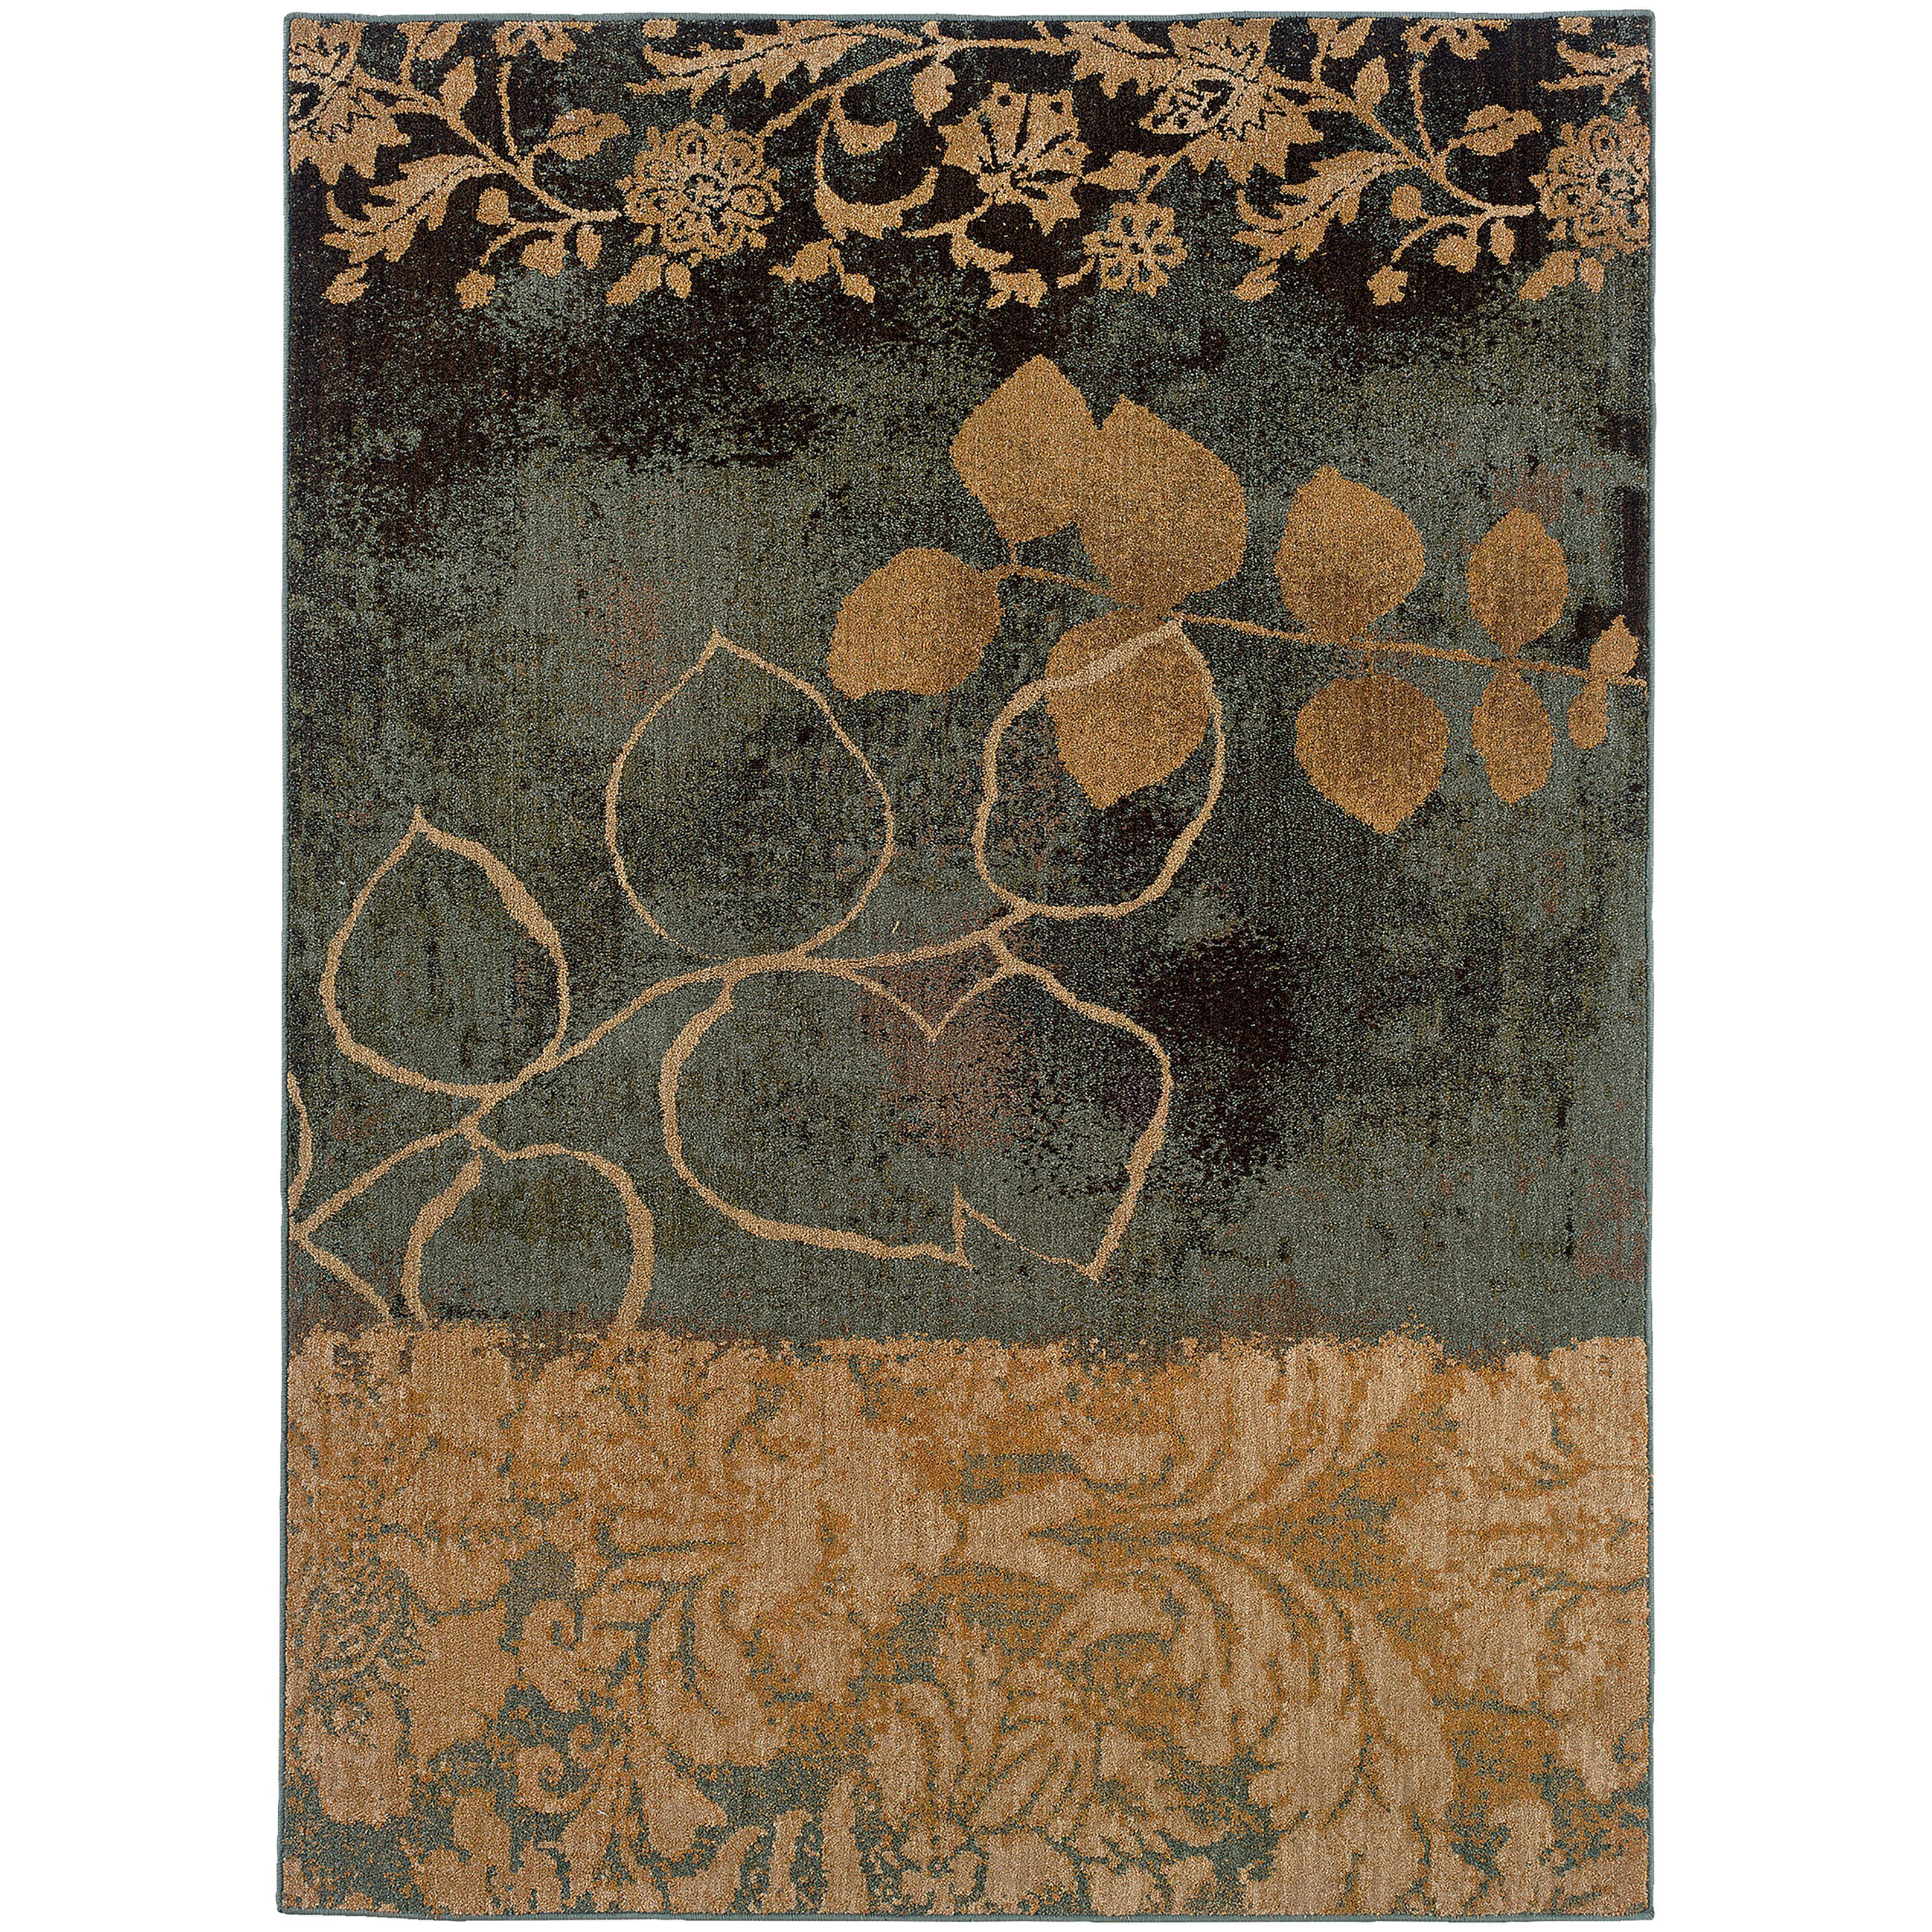 "Oriental Weavers Infinity 9'10"" X 12' 9"" Rug - Item Number: I1133B300390ST"